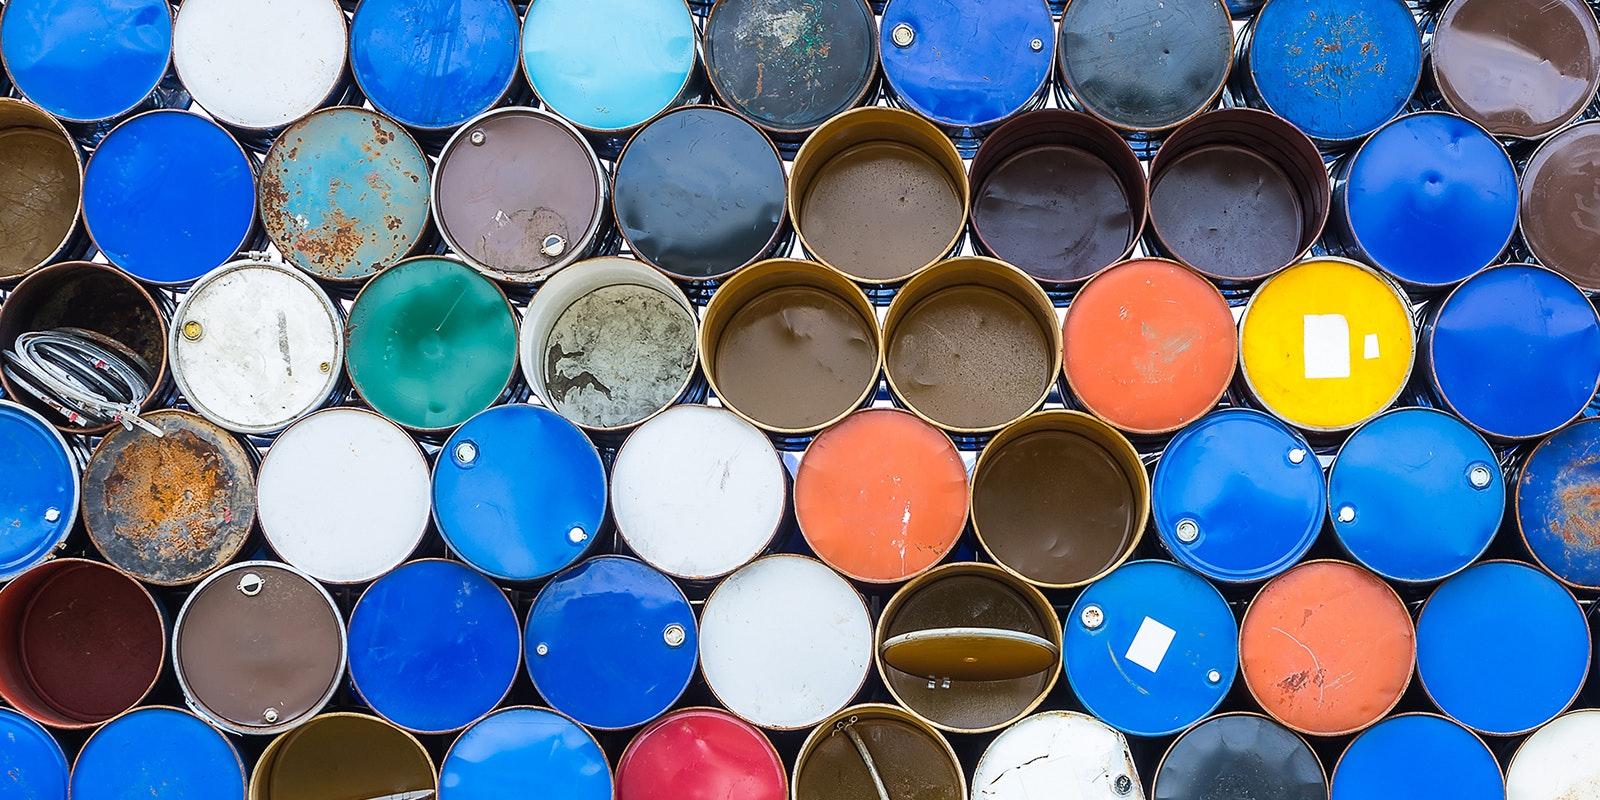 Photo Resources Contaminated Waste